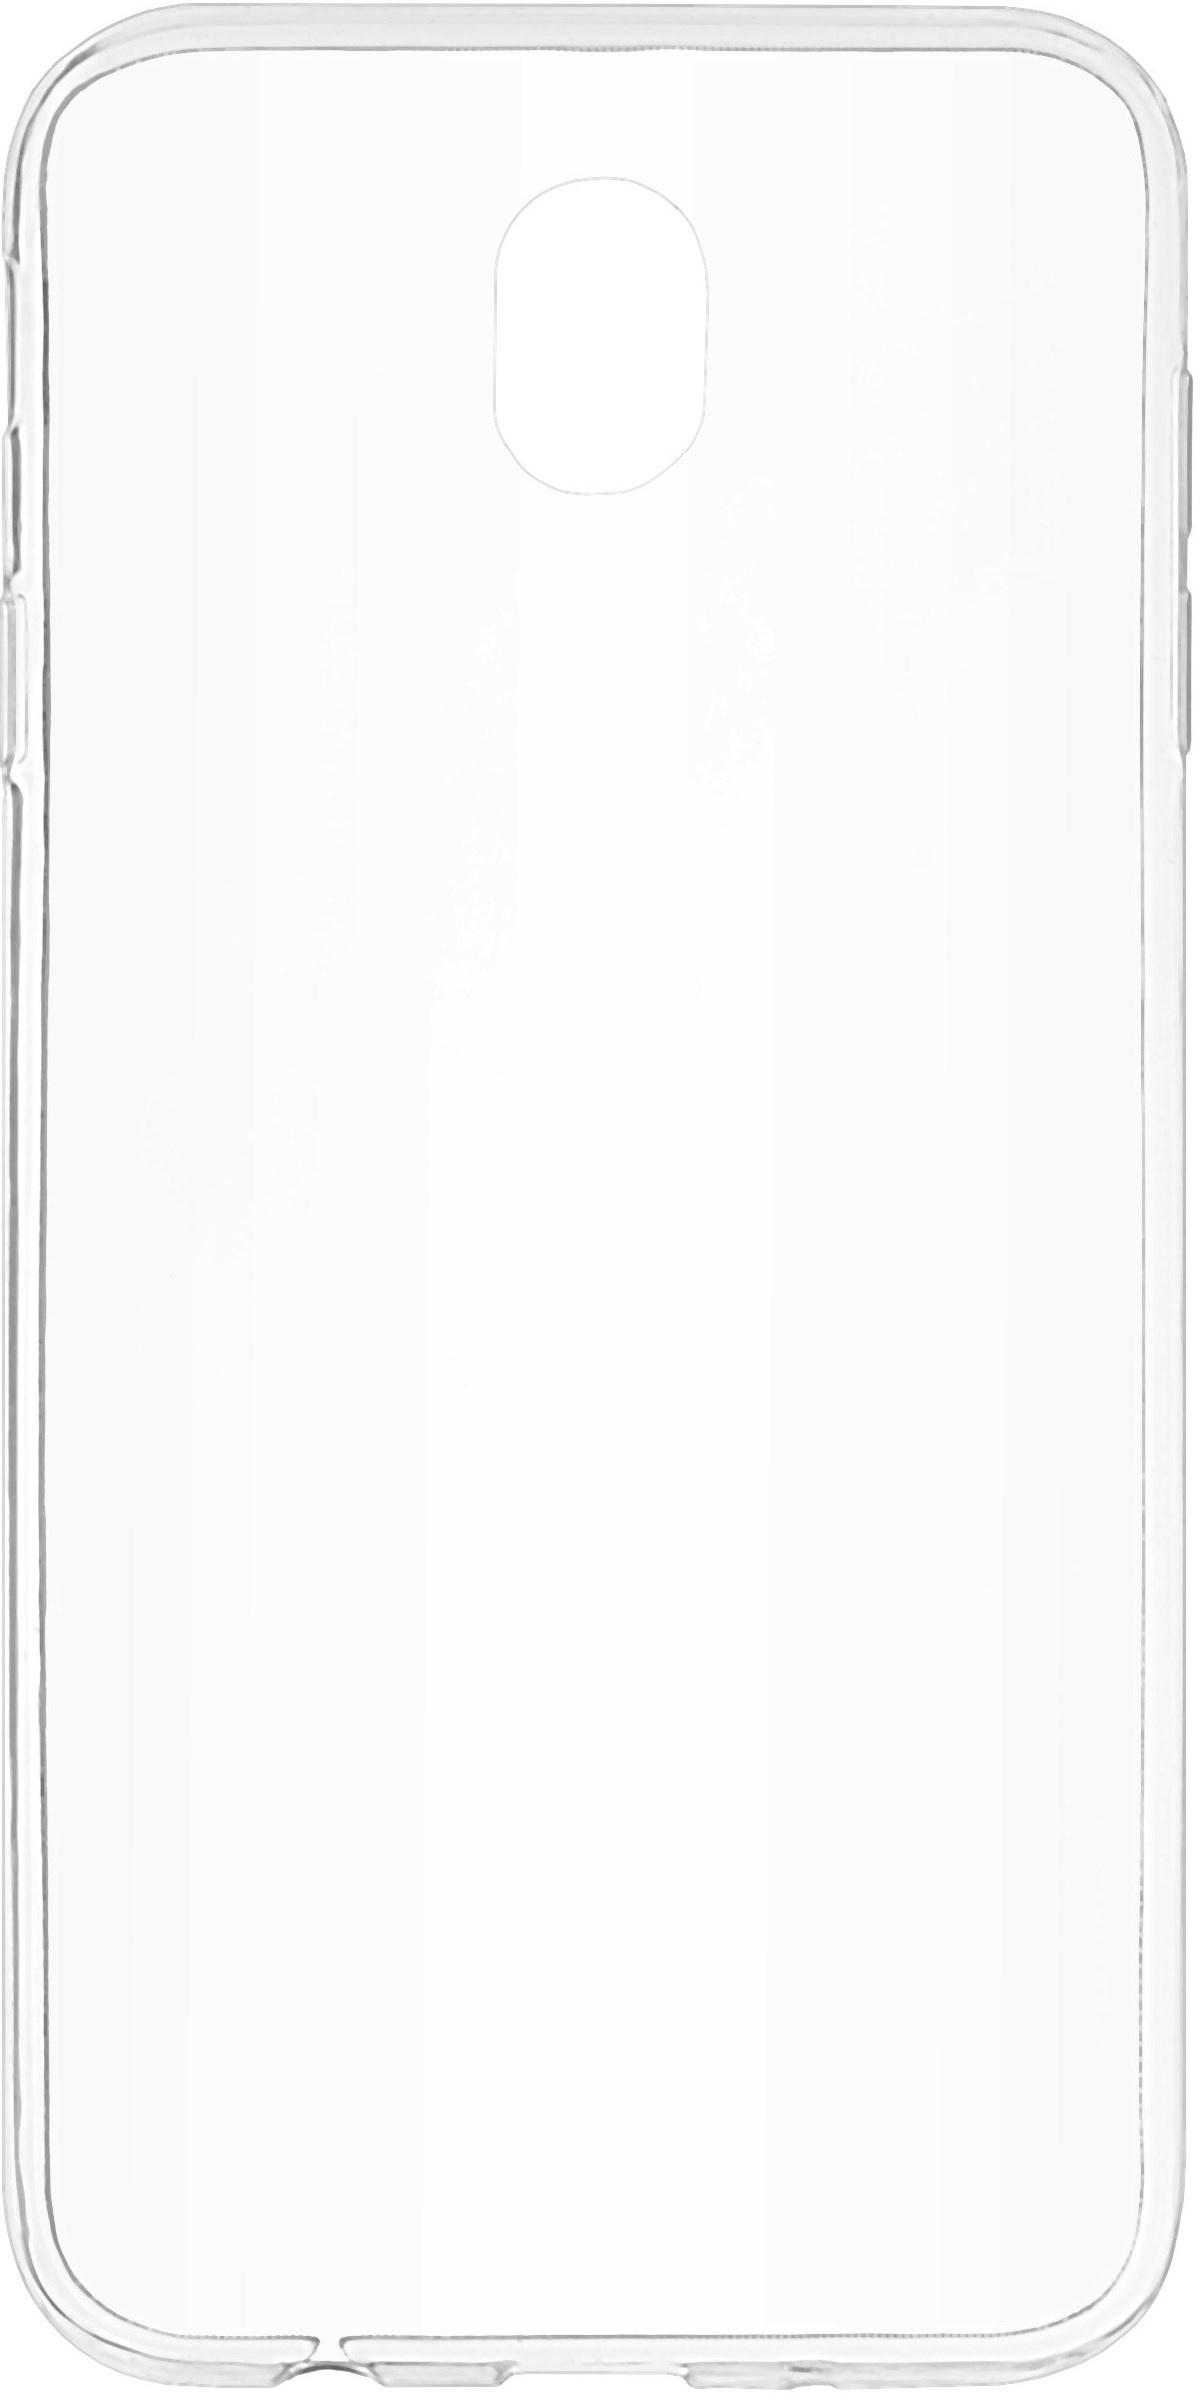 Чехол для сотового телефона skinBOX Slim Silicone, 4660041409161, прозрачный цена и фото